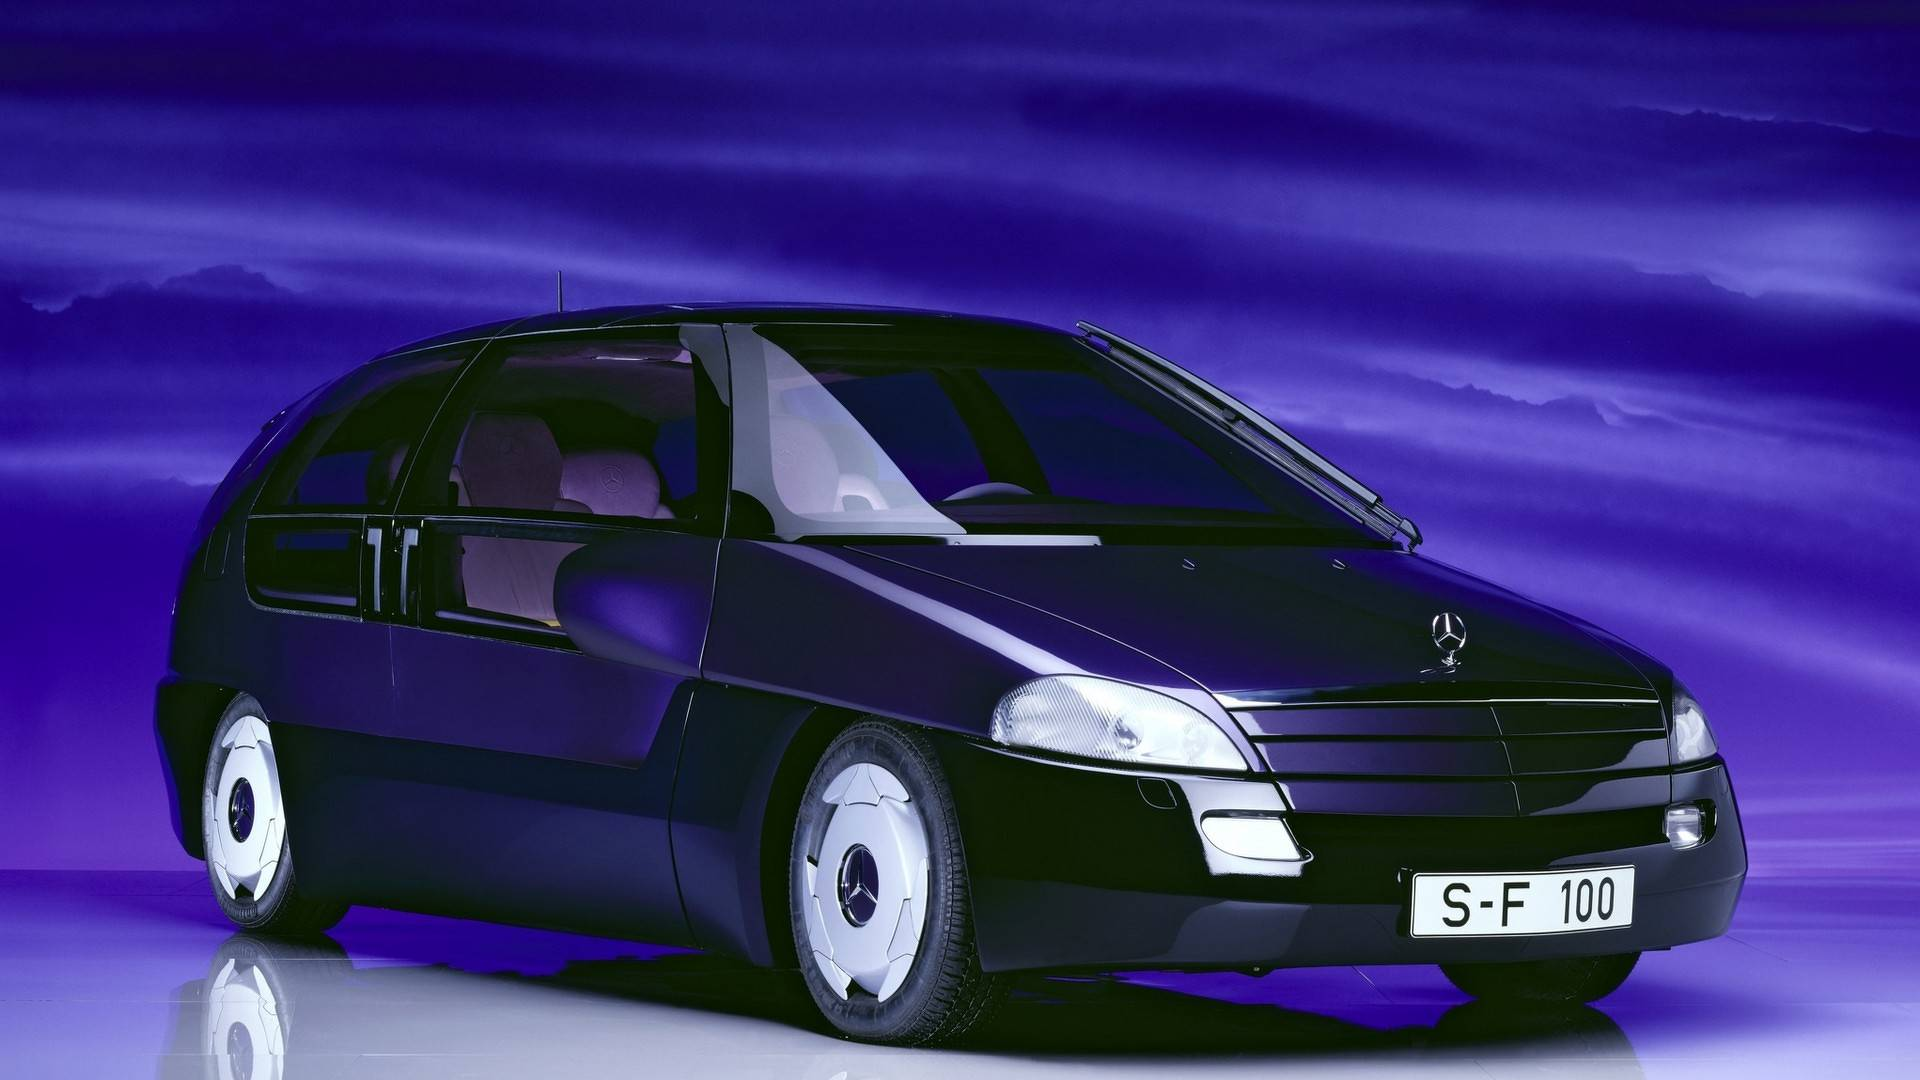 1991 mercedes f100 concept مرسدس F100 مدل ۱۹۹۱ نقد و بررسی این خودرو زیبا   اجاره ماشین